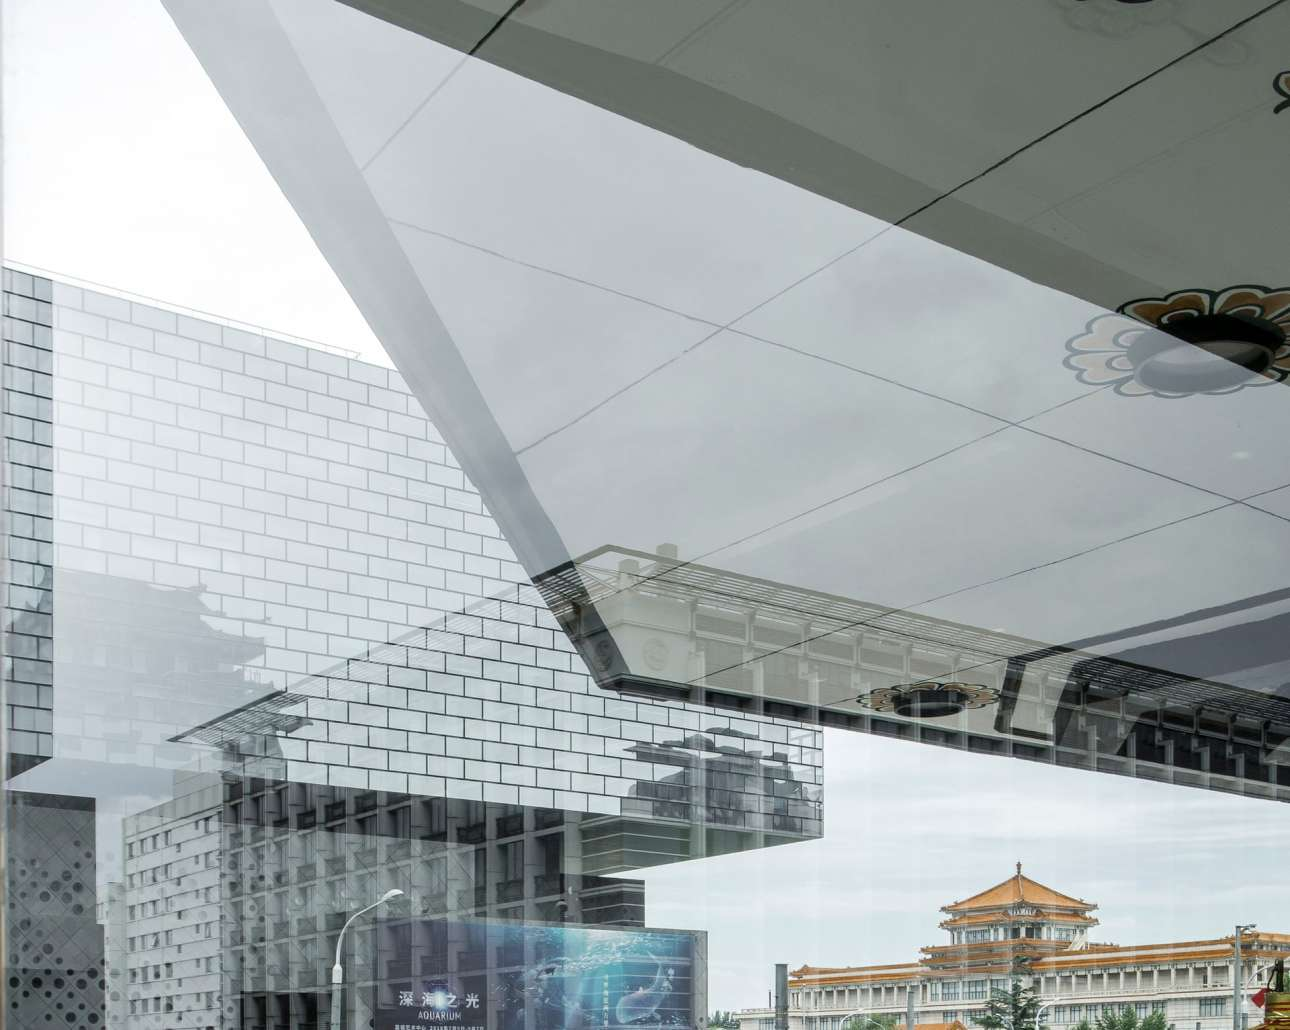 «Guardian Art Center», Πεκίνο, Κίνα, γραφείο Büro Ole Scheeren, στην κατηγορία «Εξωτερική όψη»